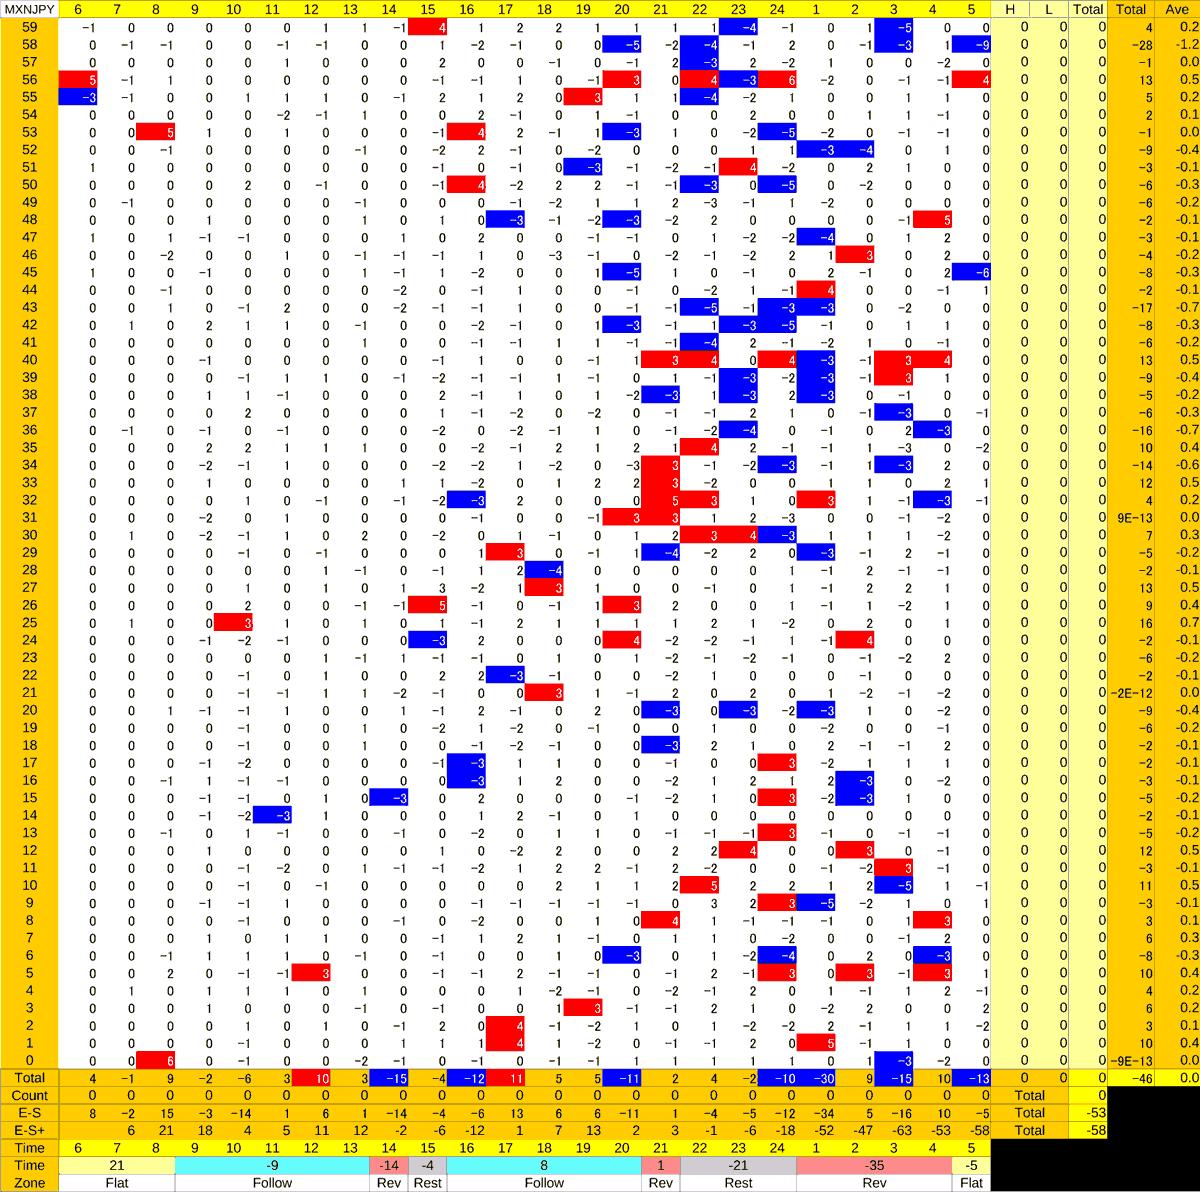 20200922_HS(3)MXNJPY